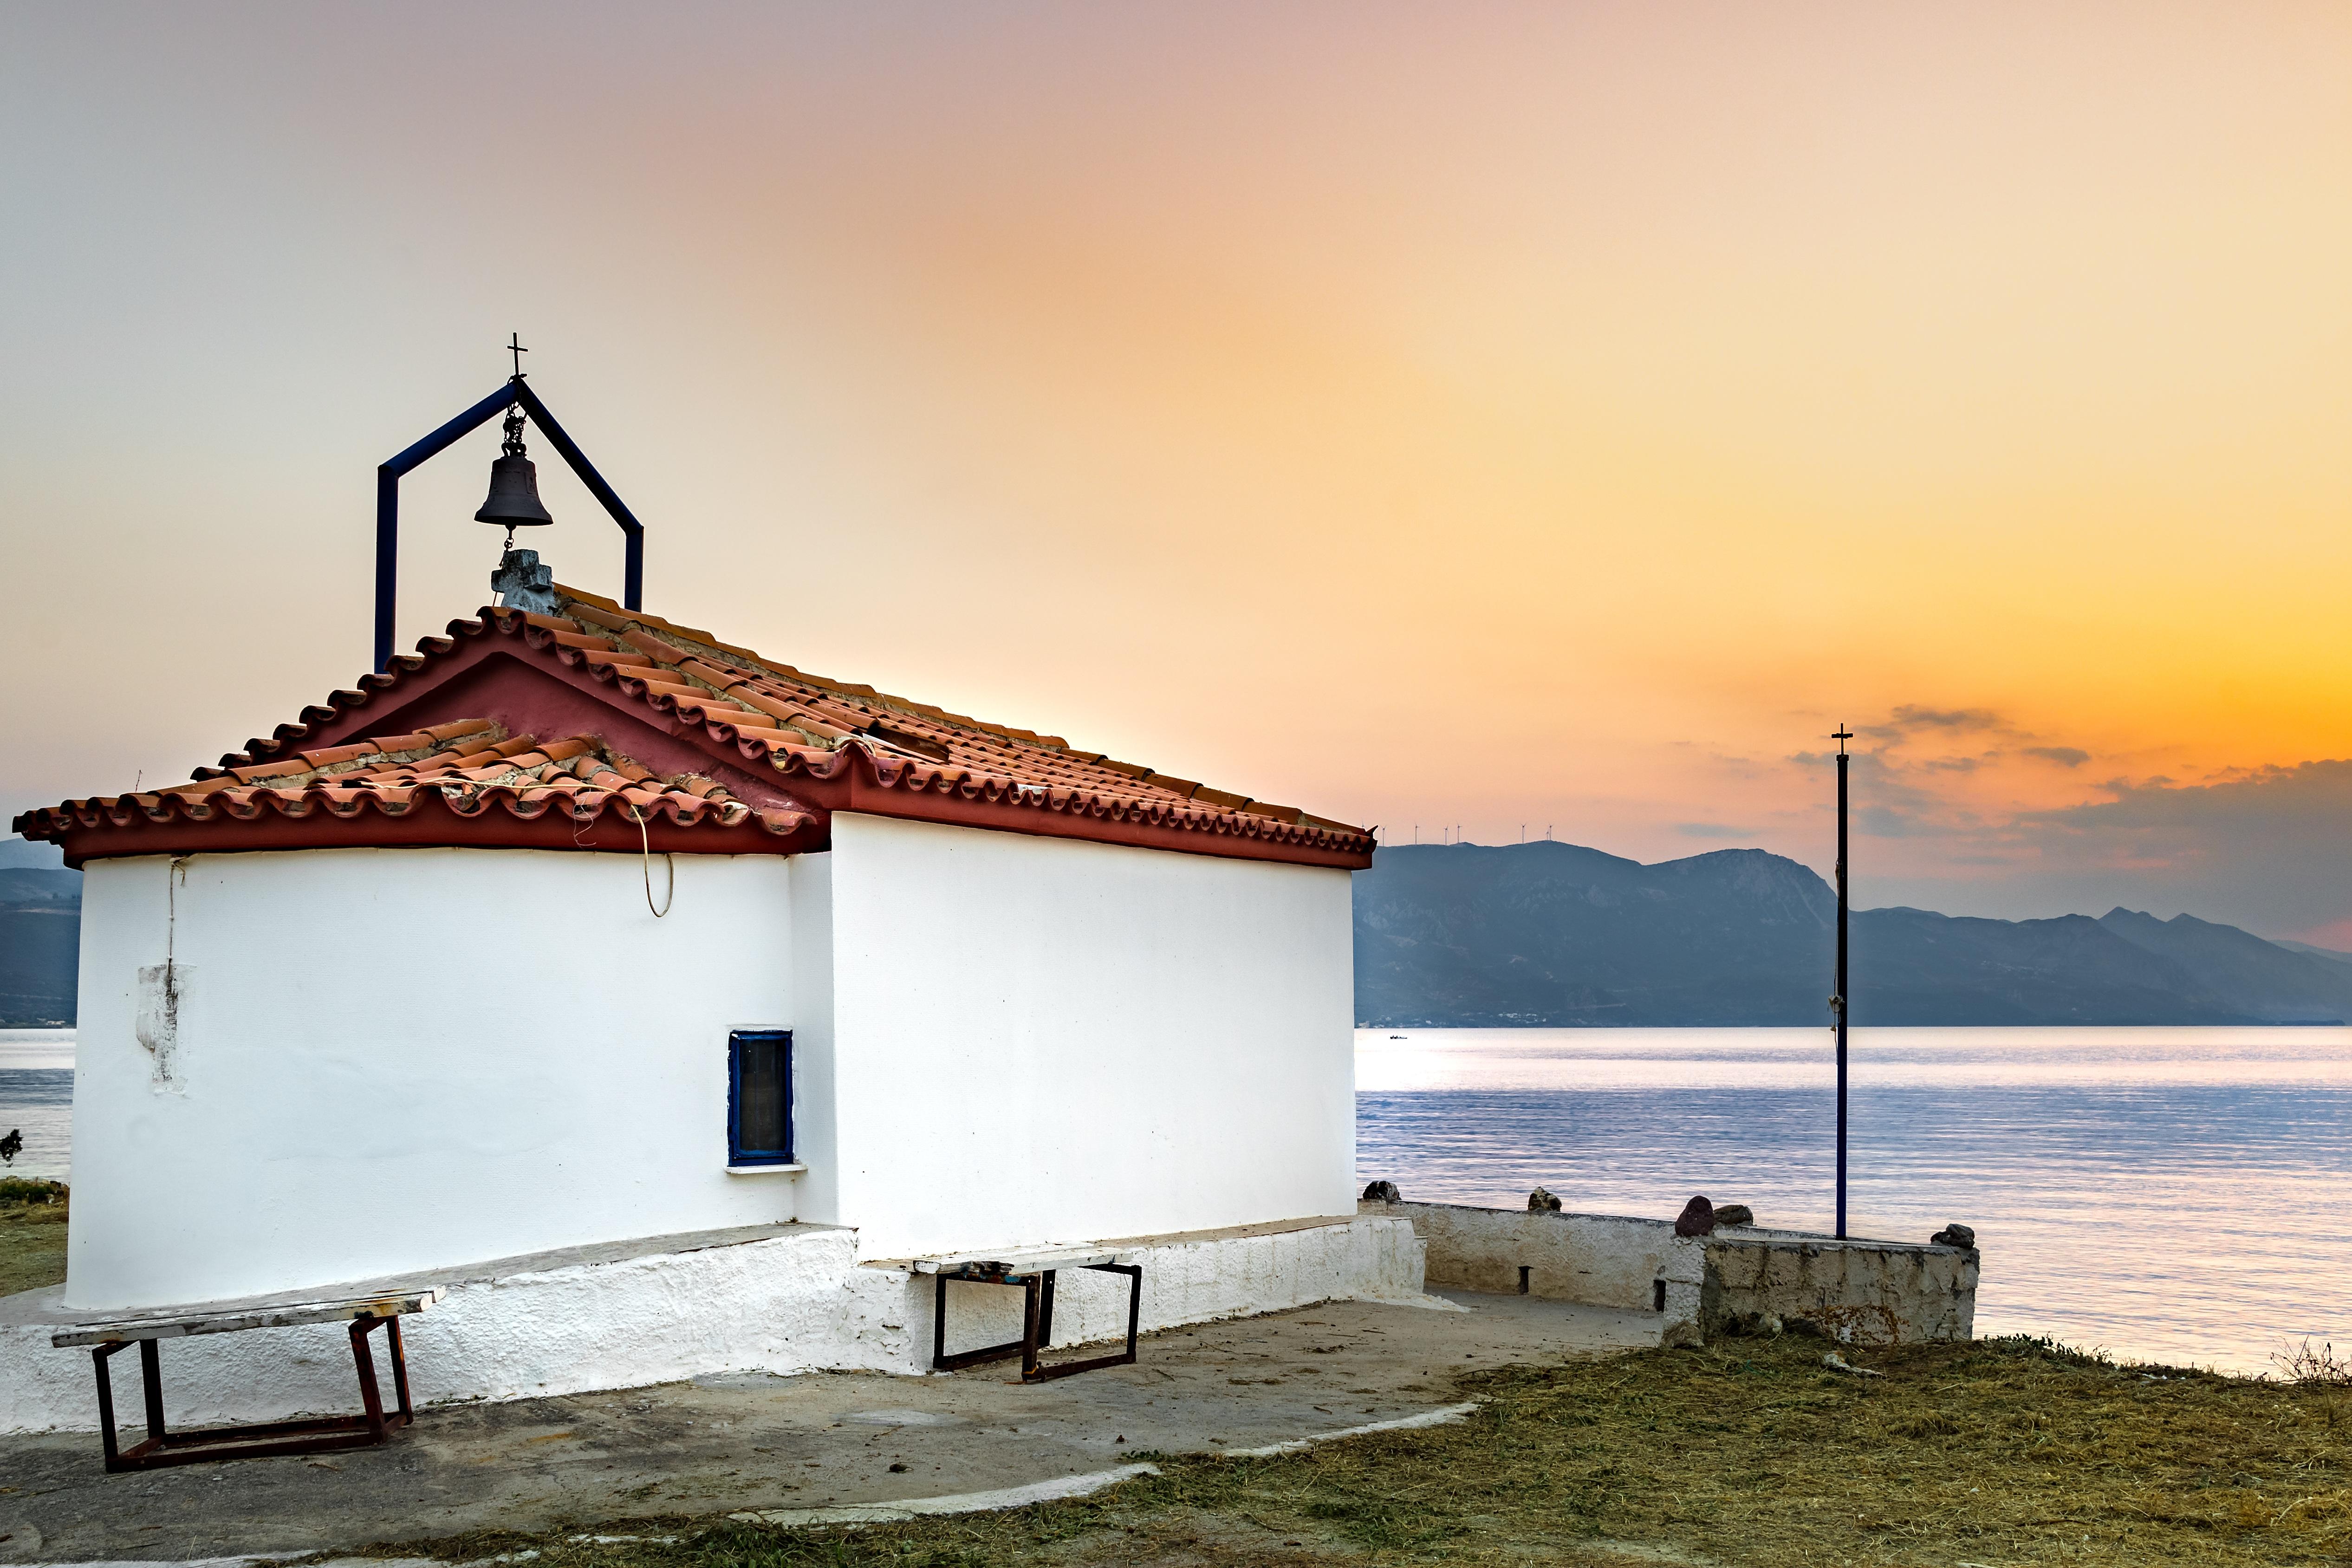 Haus am meer bei sonnenuntergang  Kostenlose foto : Landschaft, Meer, Küste, Natur, Ozean, die ...